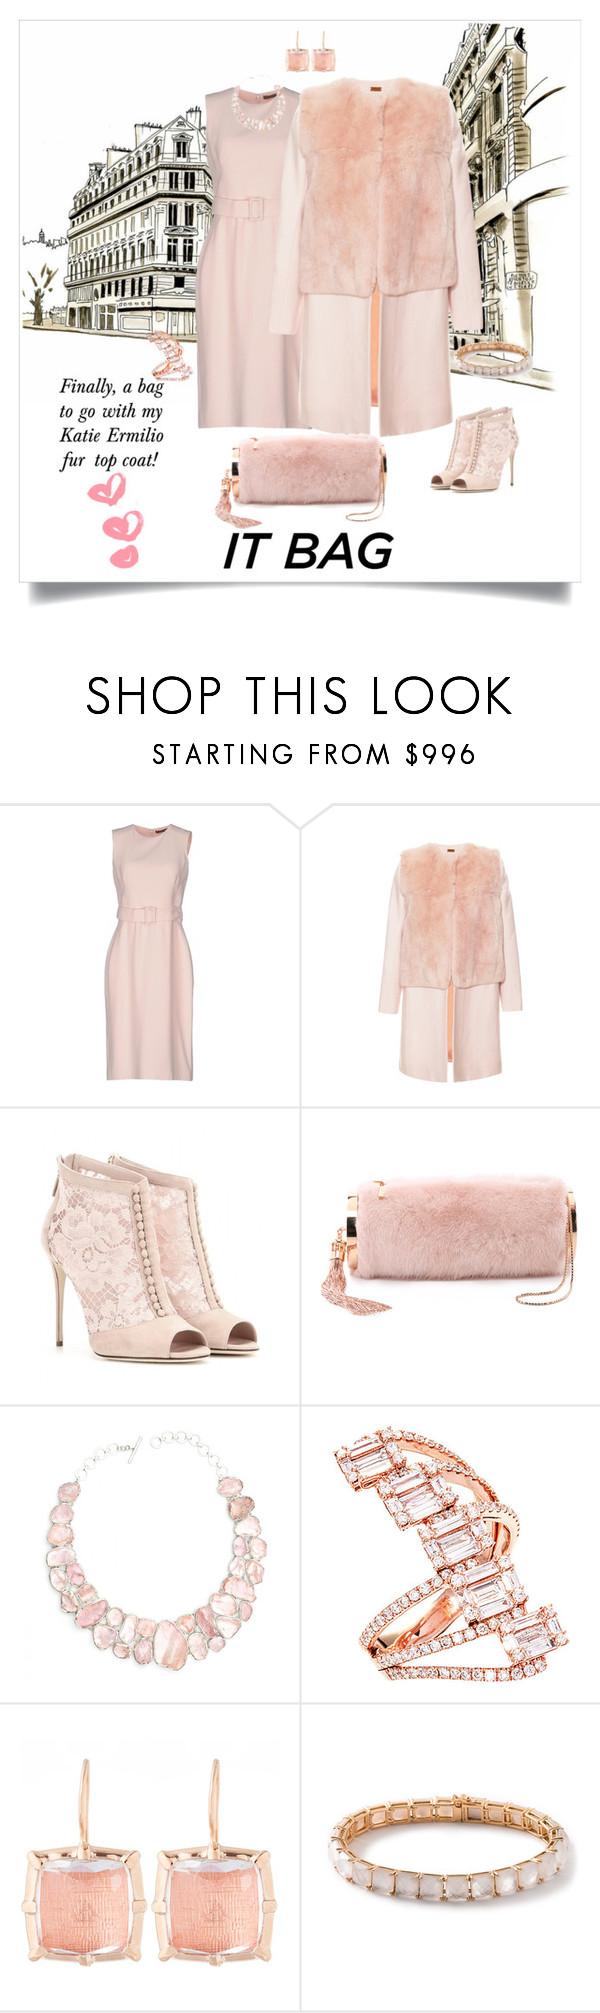 """It Bag"" by shoecraycray ❤ liked on Polyvore featuring Alexander McQueen, Katie Ermilio, Dolce&Gabbana, Monique Lhuillier, Ascension, Larkspur & Hawk, Ippolita, women's clothing, women's fashion and women"